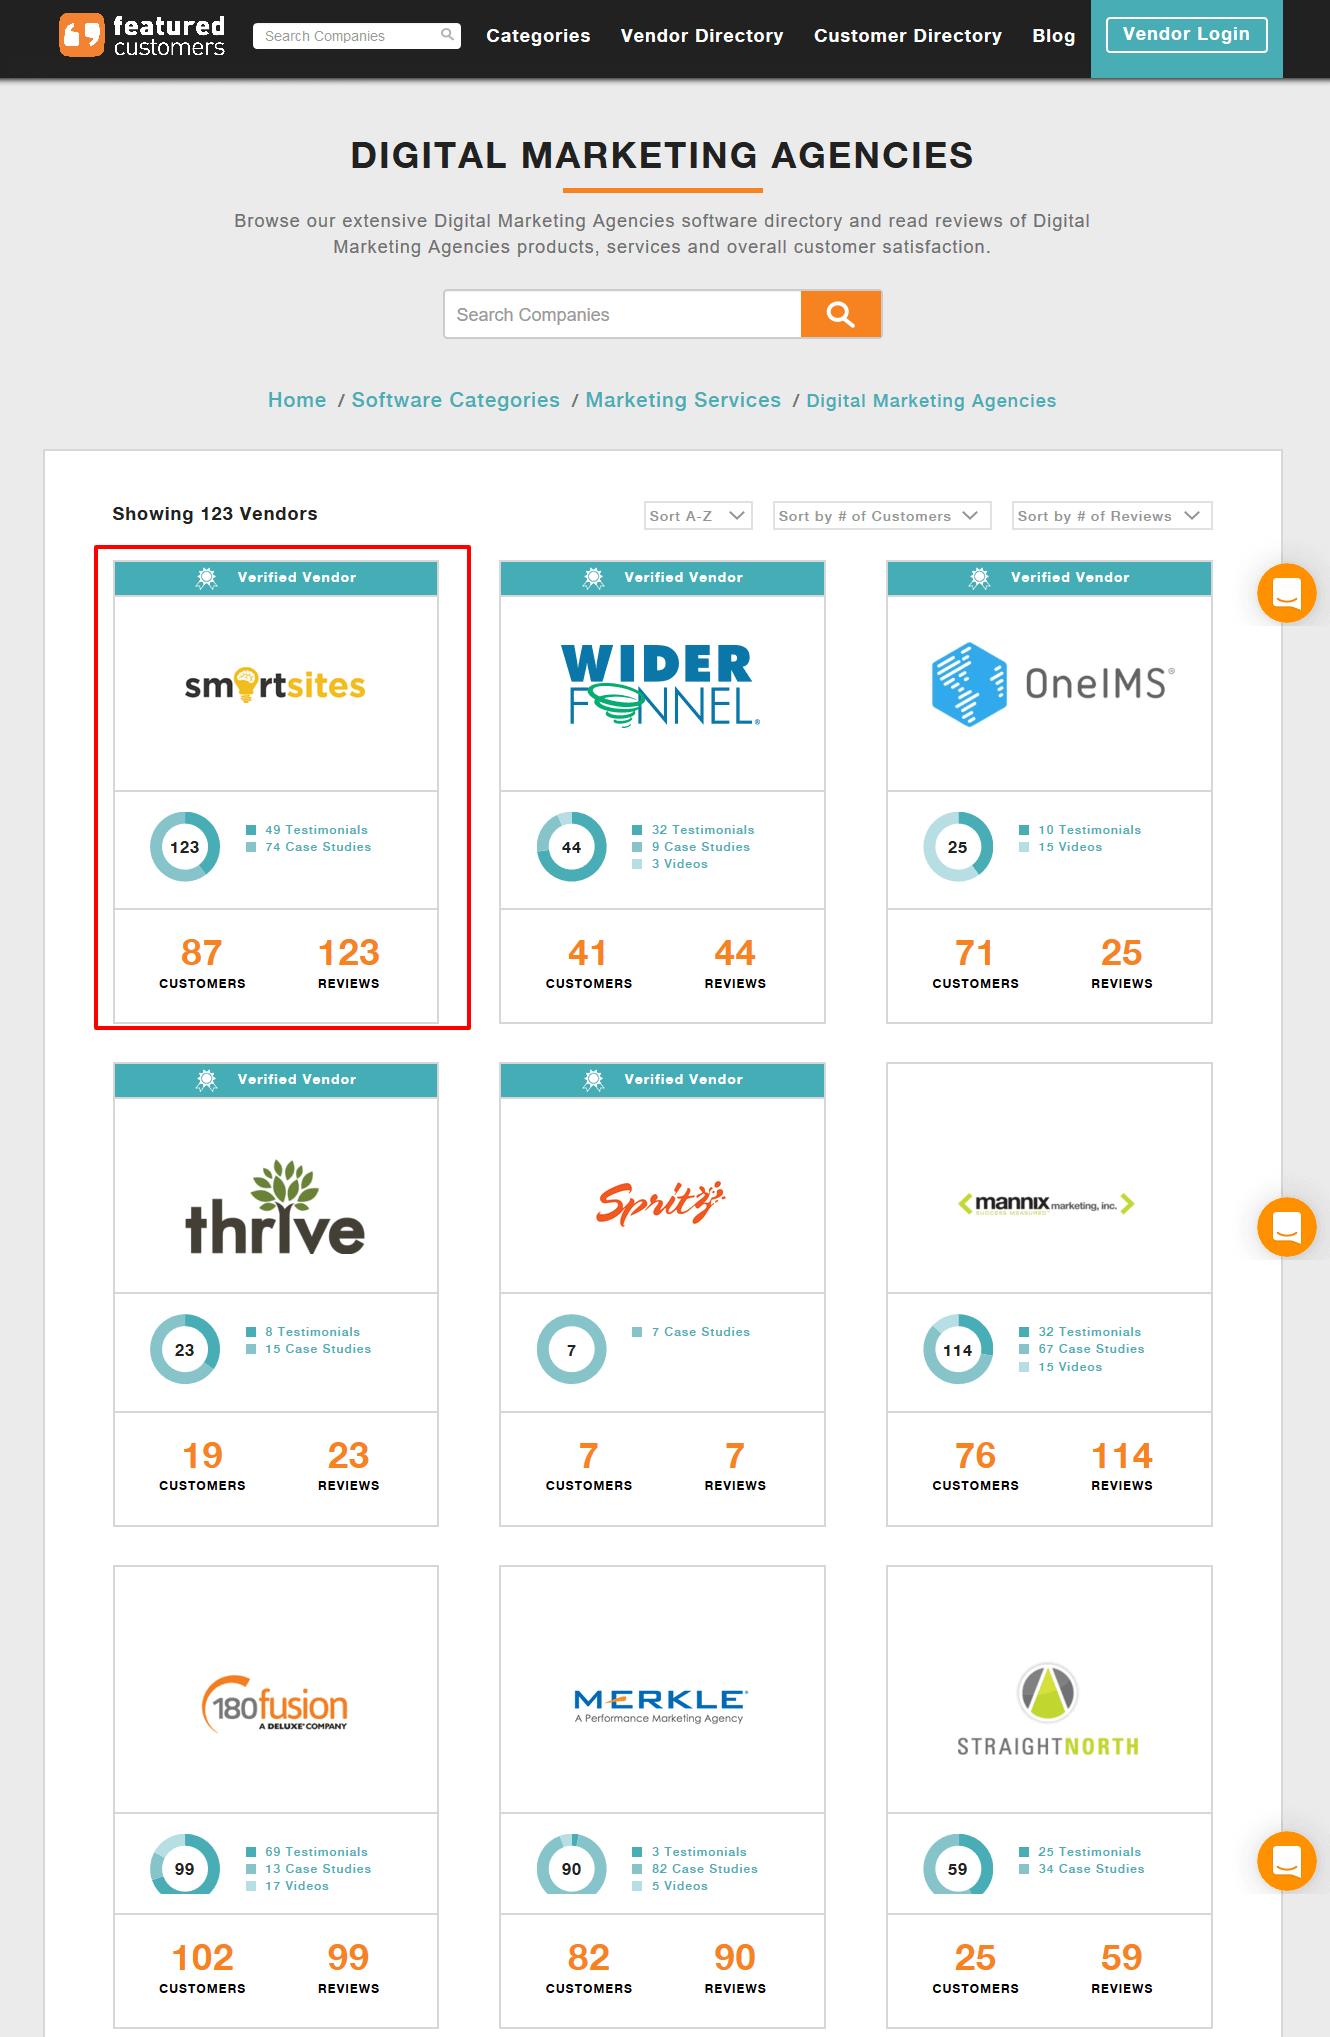 SmartSites Tops List Of Digital Marketing Agencies On FeaturedCustomers.com